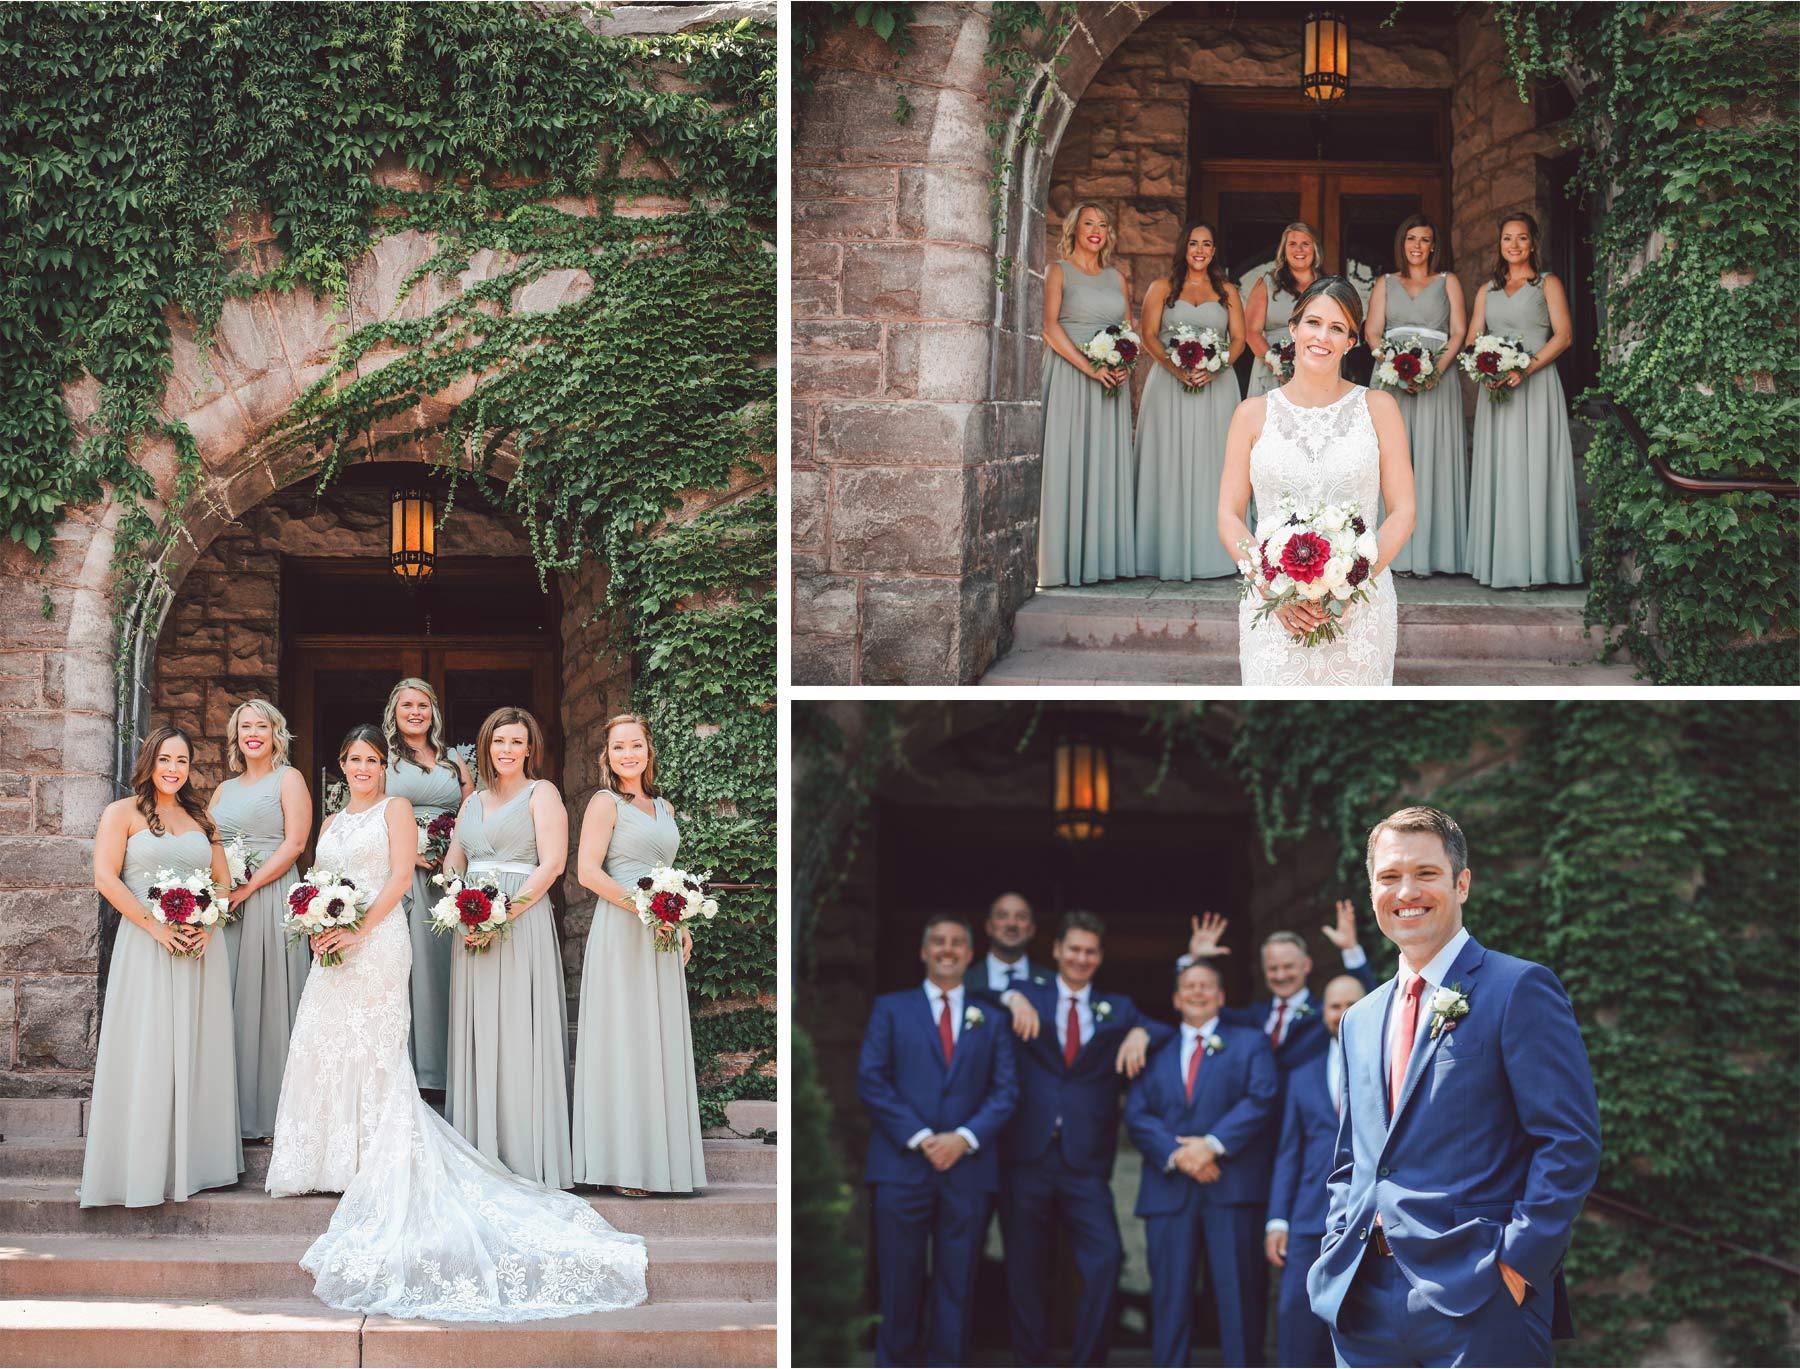 11-Minneapolis-Minnesota-Wedding-Photographer-by-Vick-Photography-Van-Dusen-Mansion-Wedding-Party-Group-Megan-and-Ned.jpg